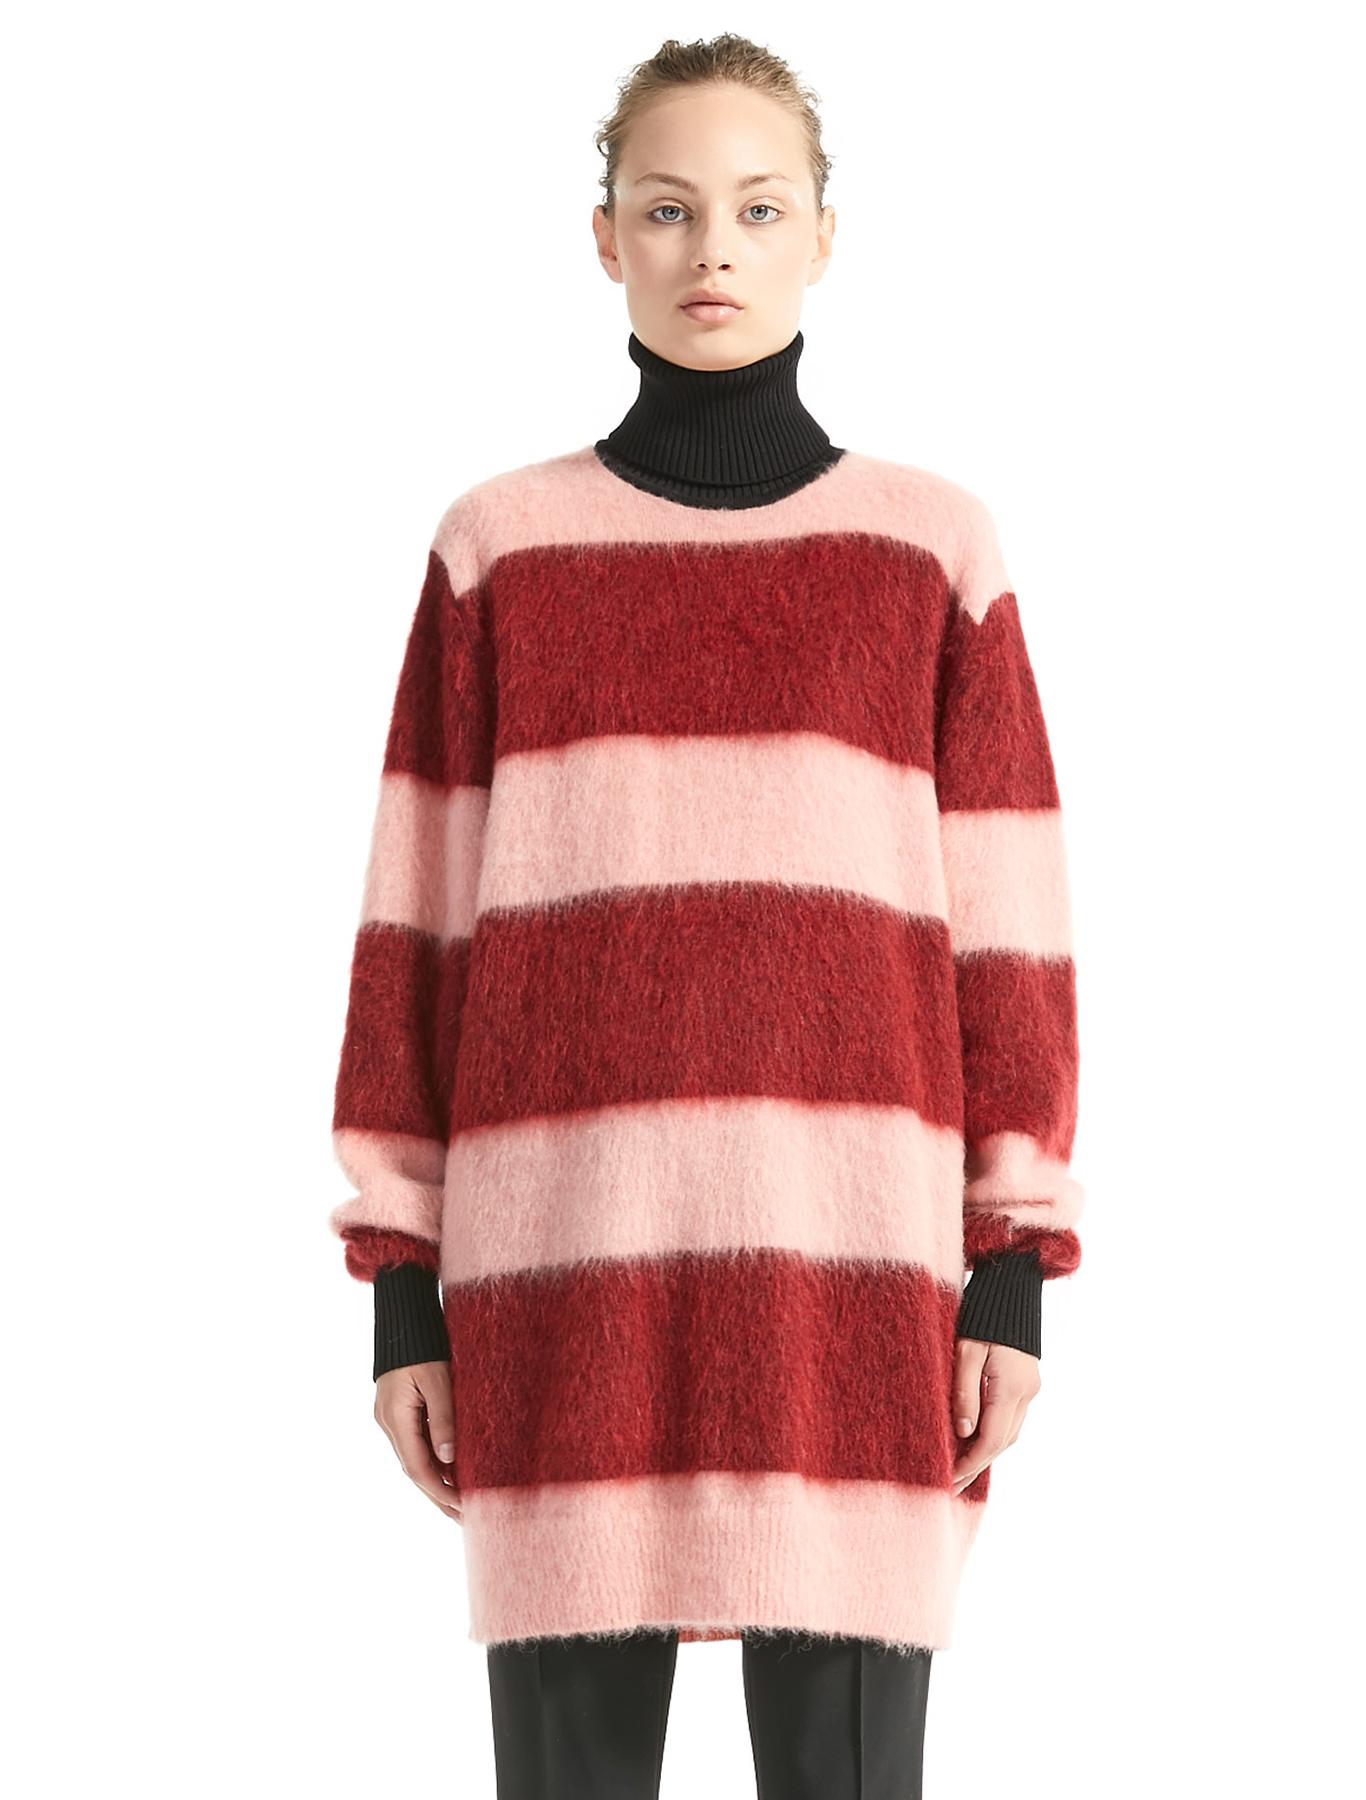 Maxi Stripe Mohair Sweater Dress, pink red - Sportmax